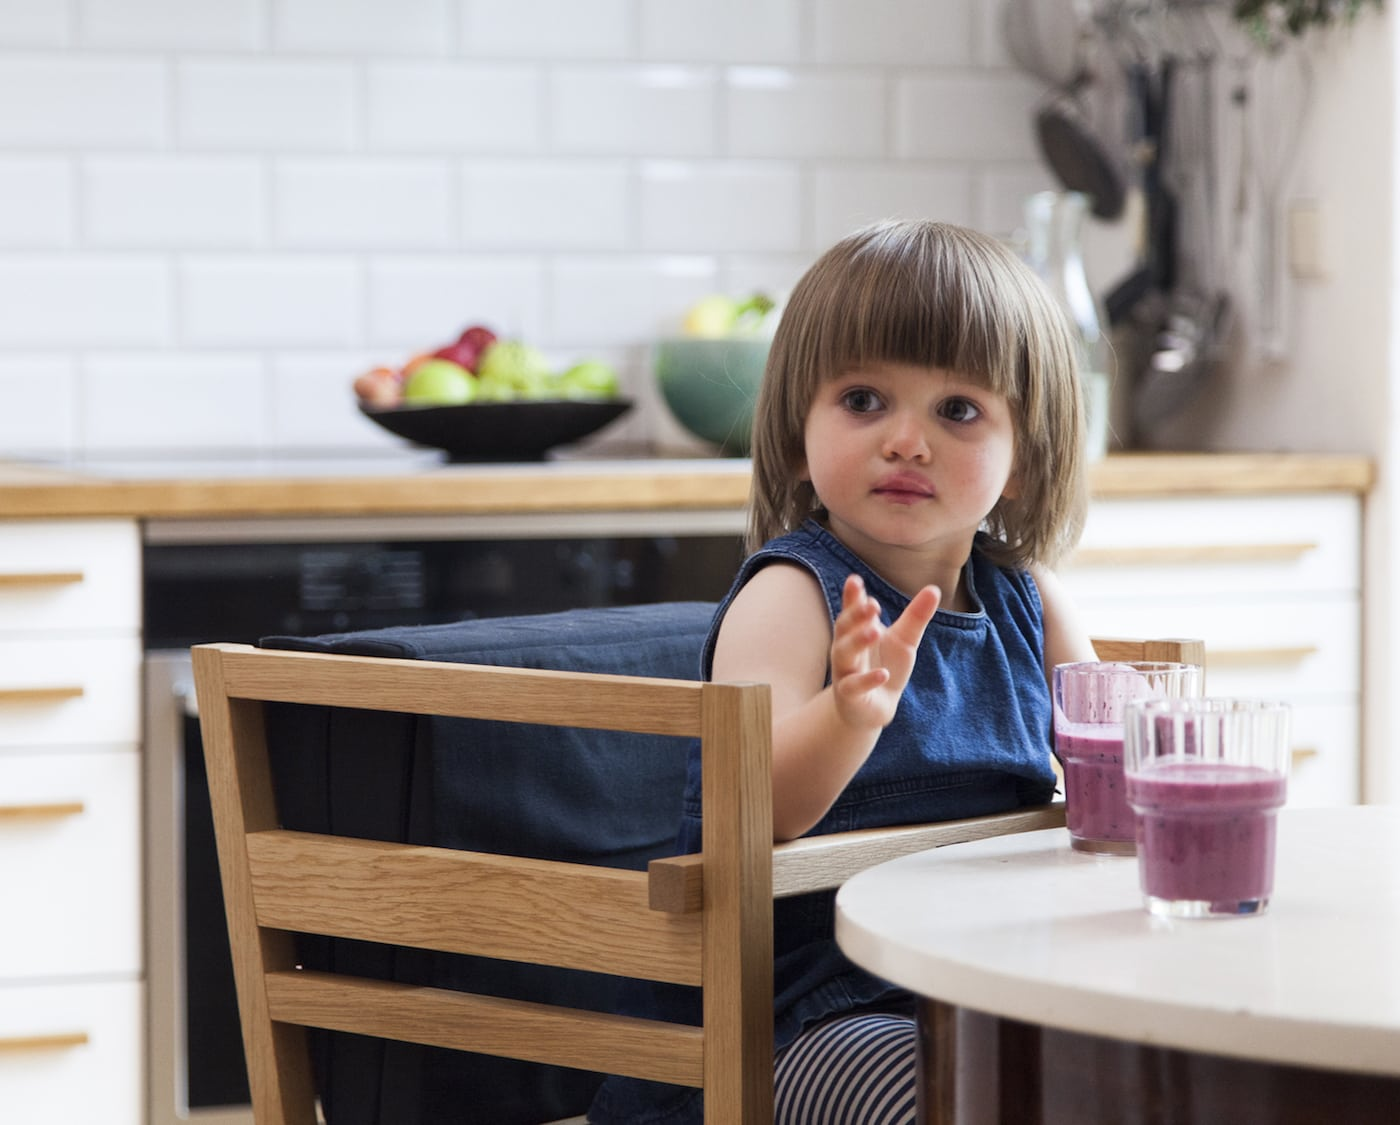 Hochstuhl für Kinder // HIMBEER